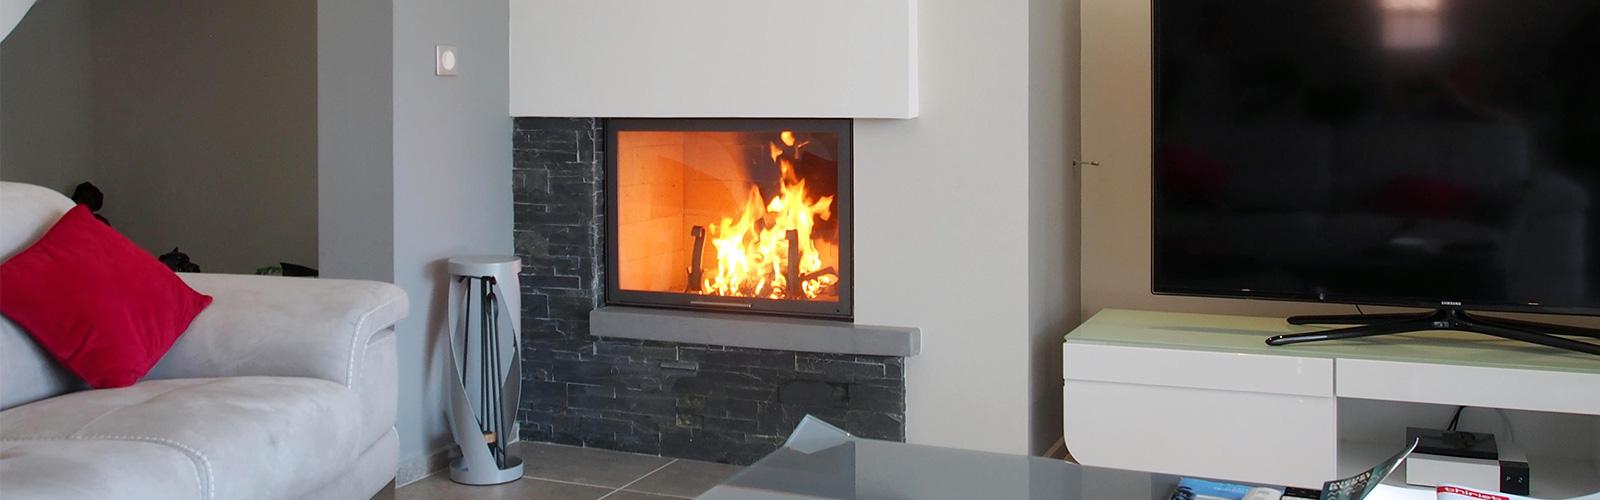 Foyer L Ensoleillado Salon De Provence : Chemin�e provence cr�ation votre artisan chemin�es en